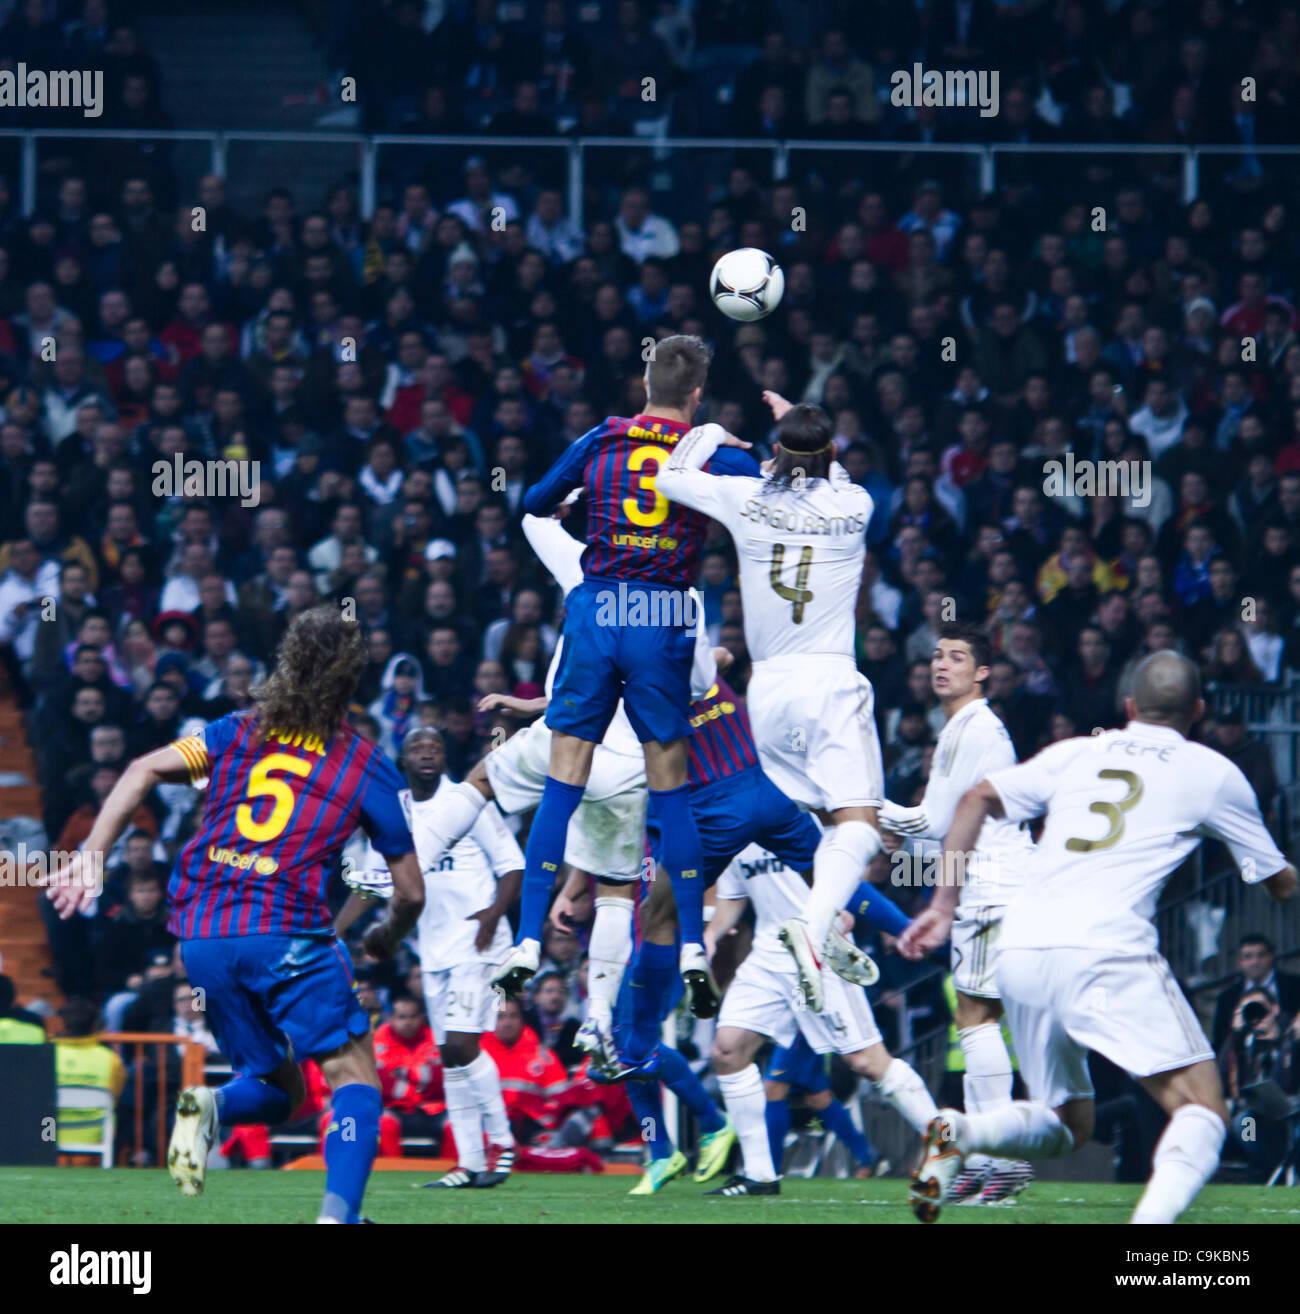 MADRID, Spain // COPA DEL REY FOOTBALL